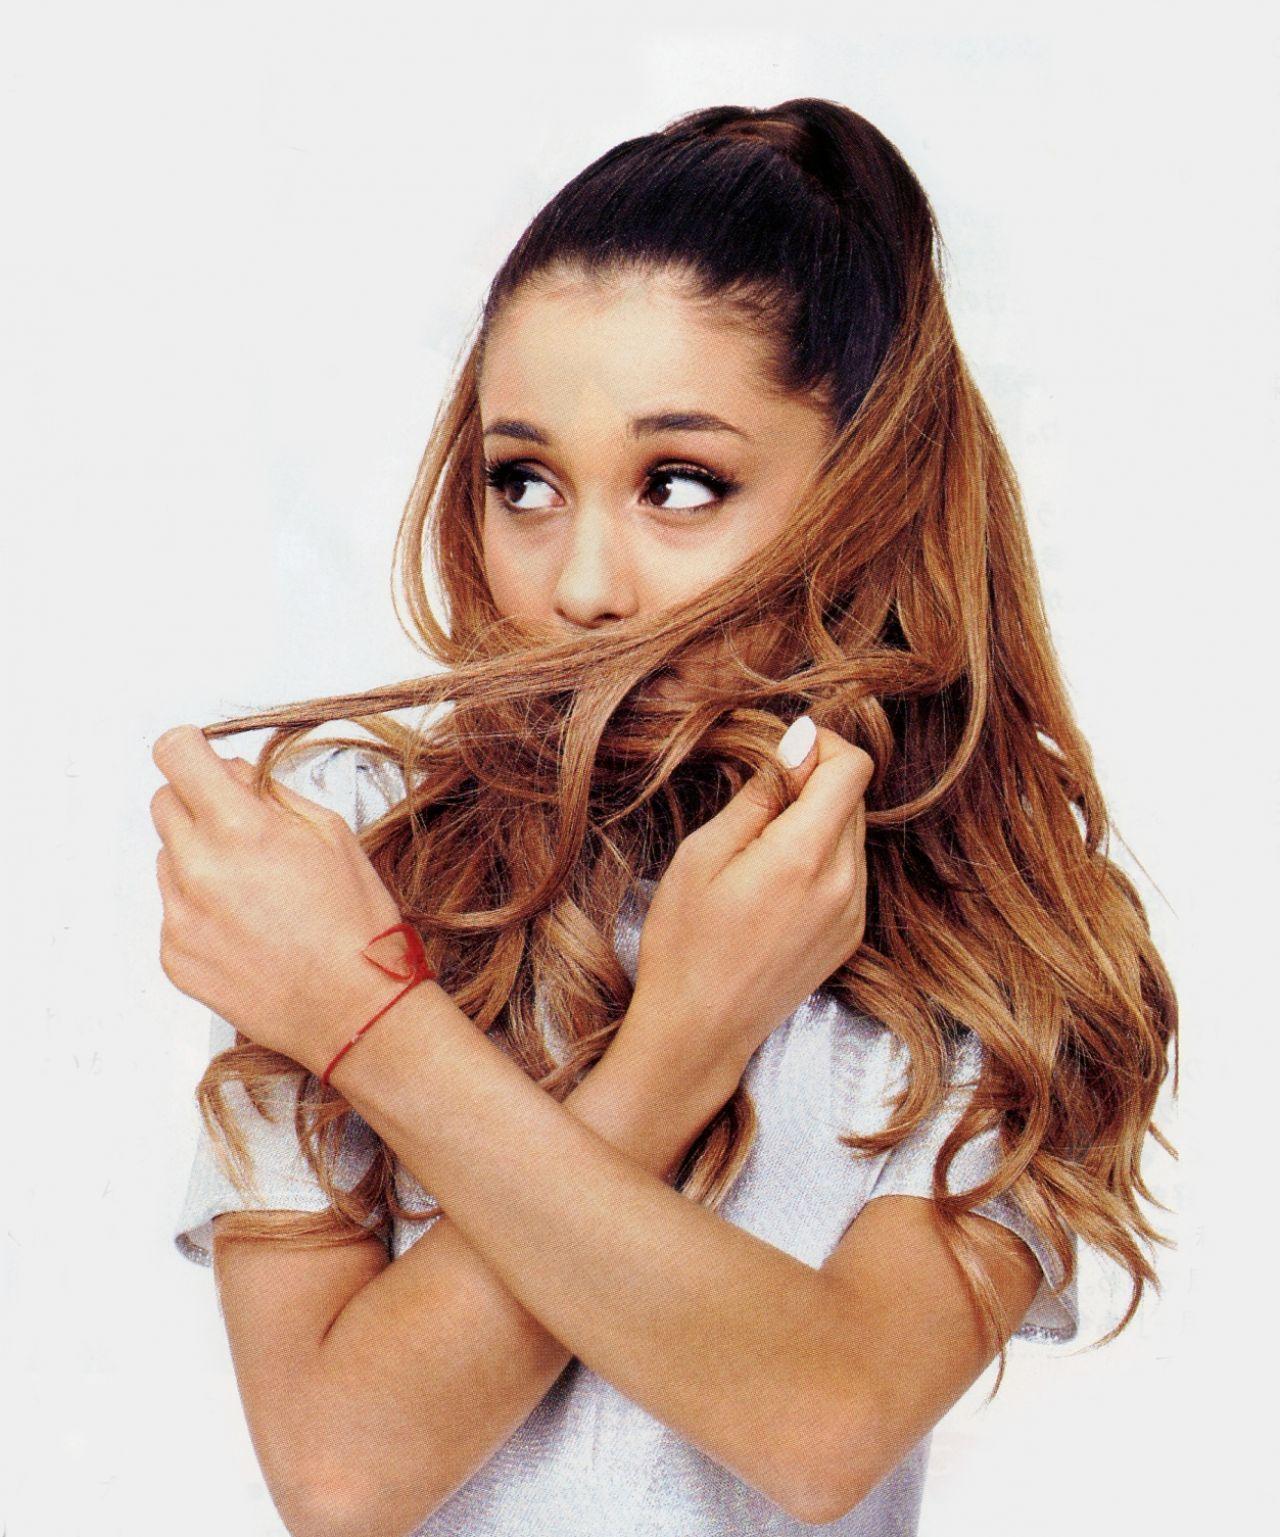 Ariana Grande Photoshoot for InRock Magazine (Japan)